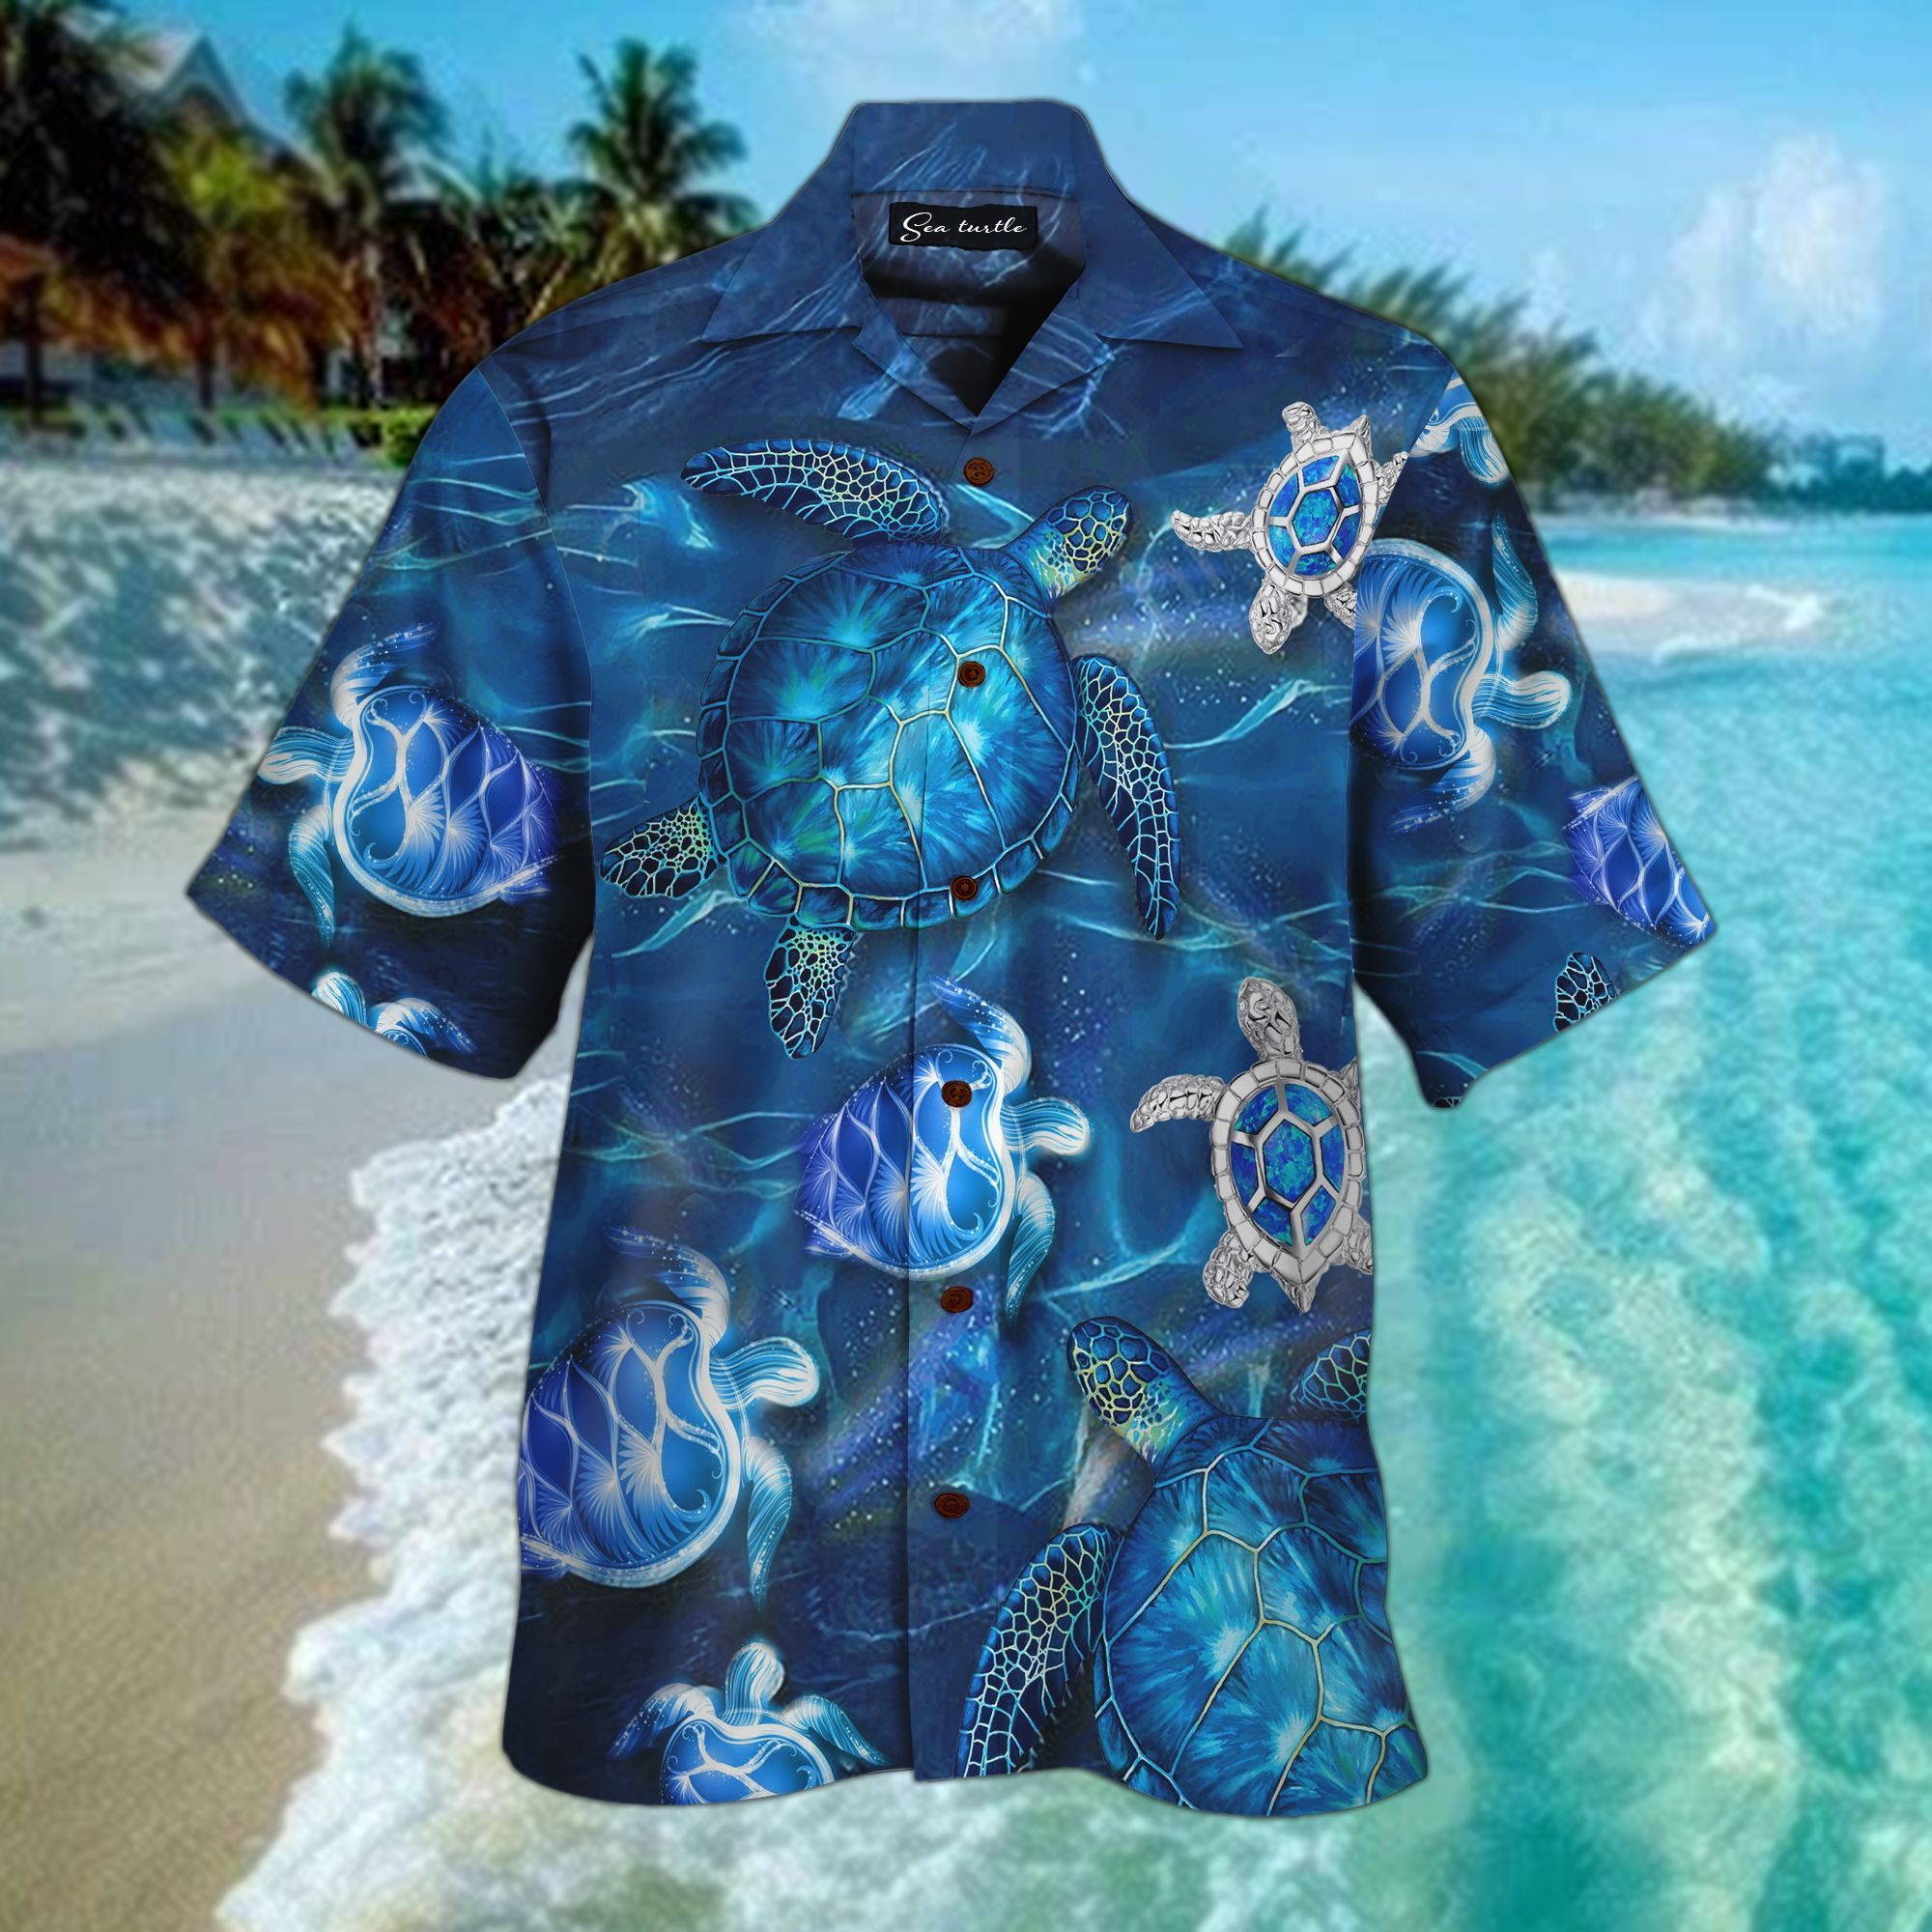 Sea Turtle 3D All Over Printed Hawaiian Shirt